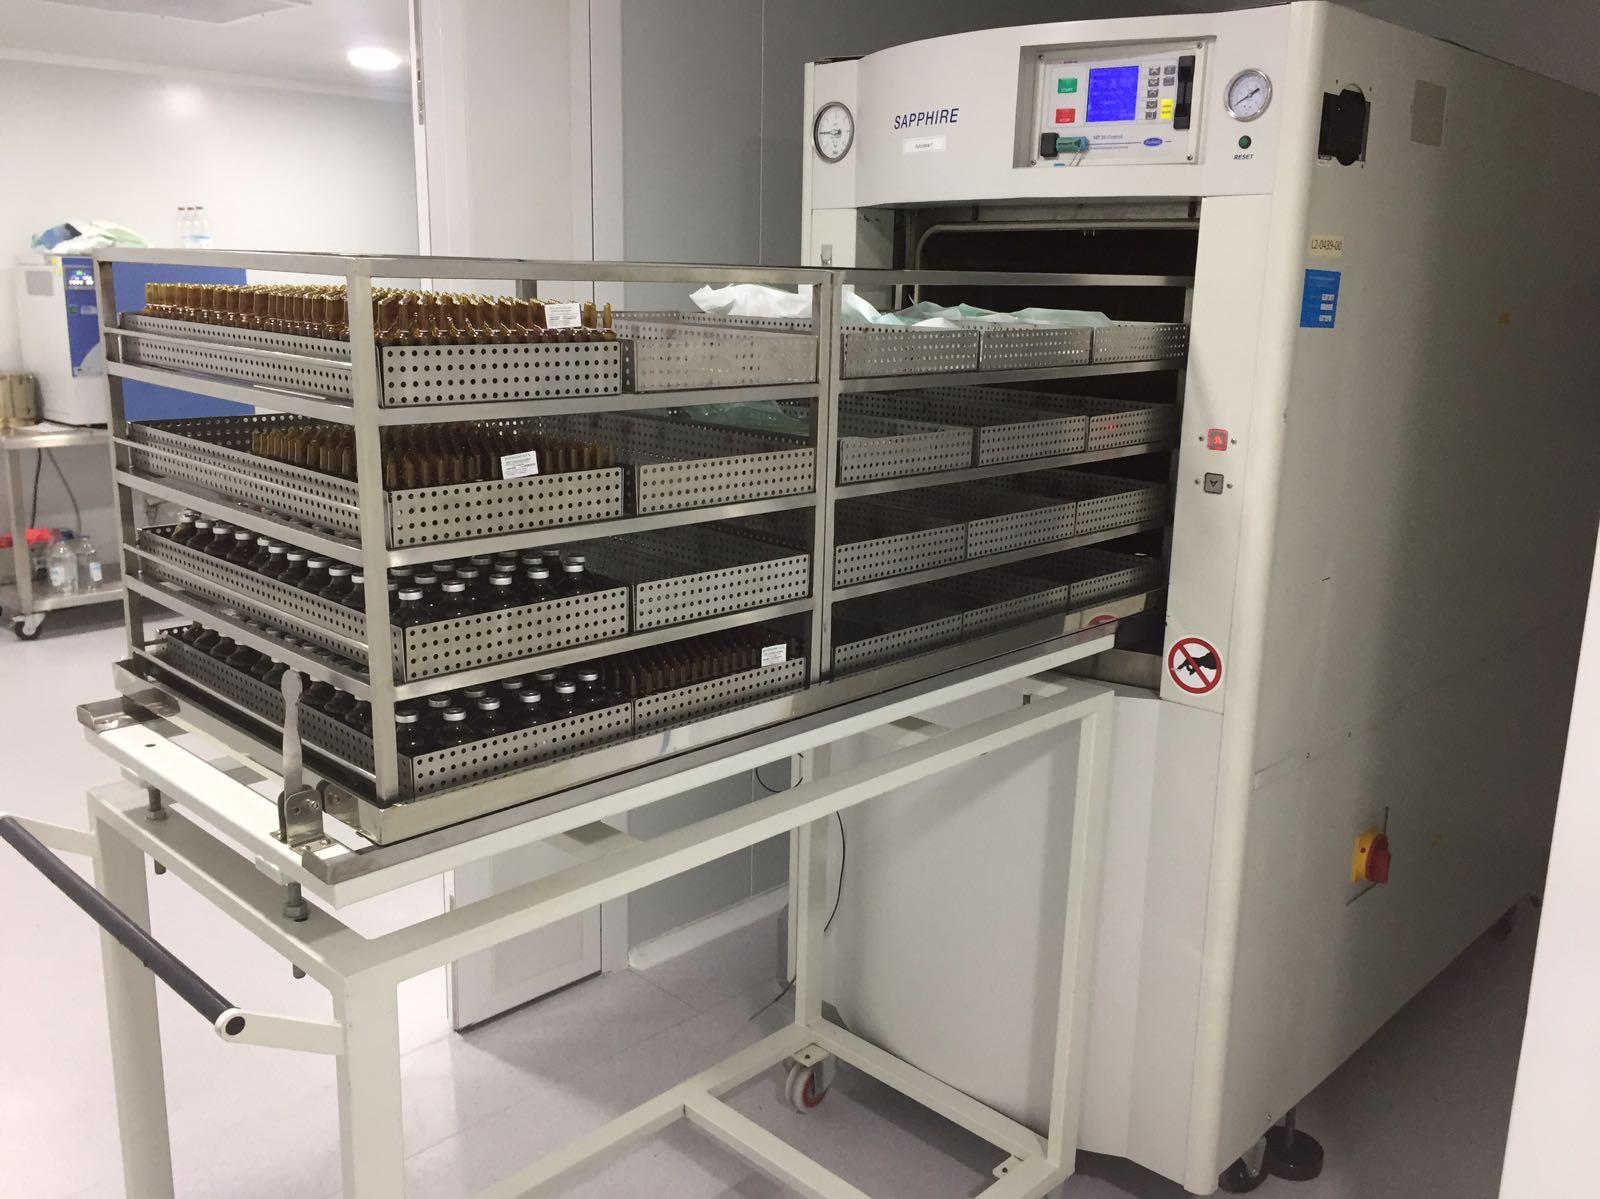 Mobiliario acero inoxidable laboratorio farmace tica for Muebles industriales madrid